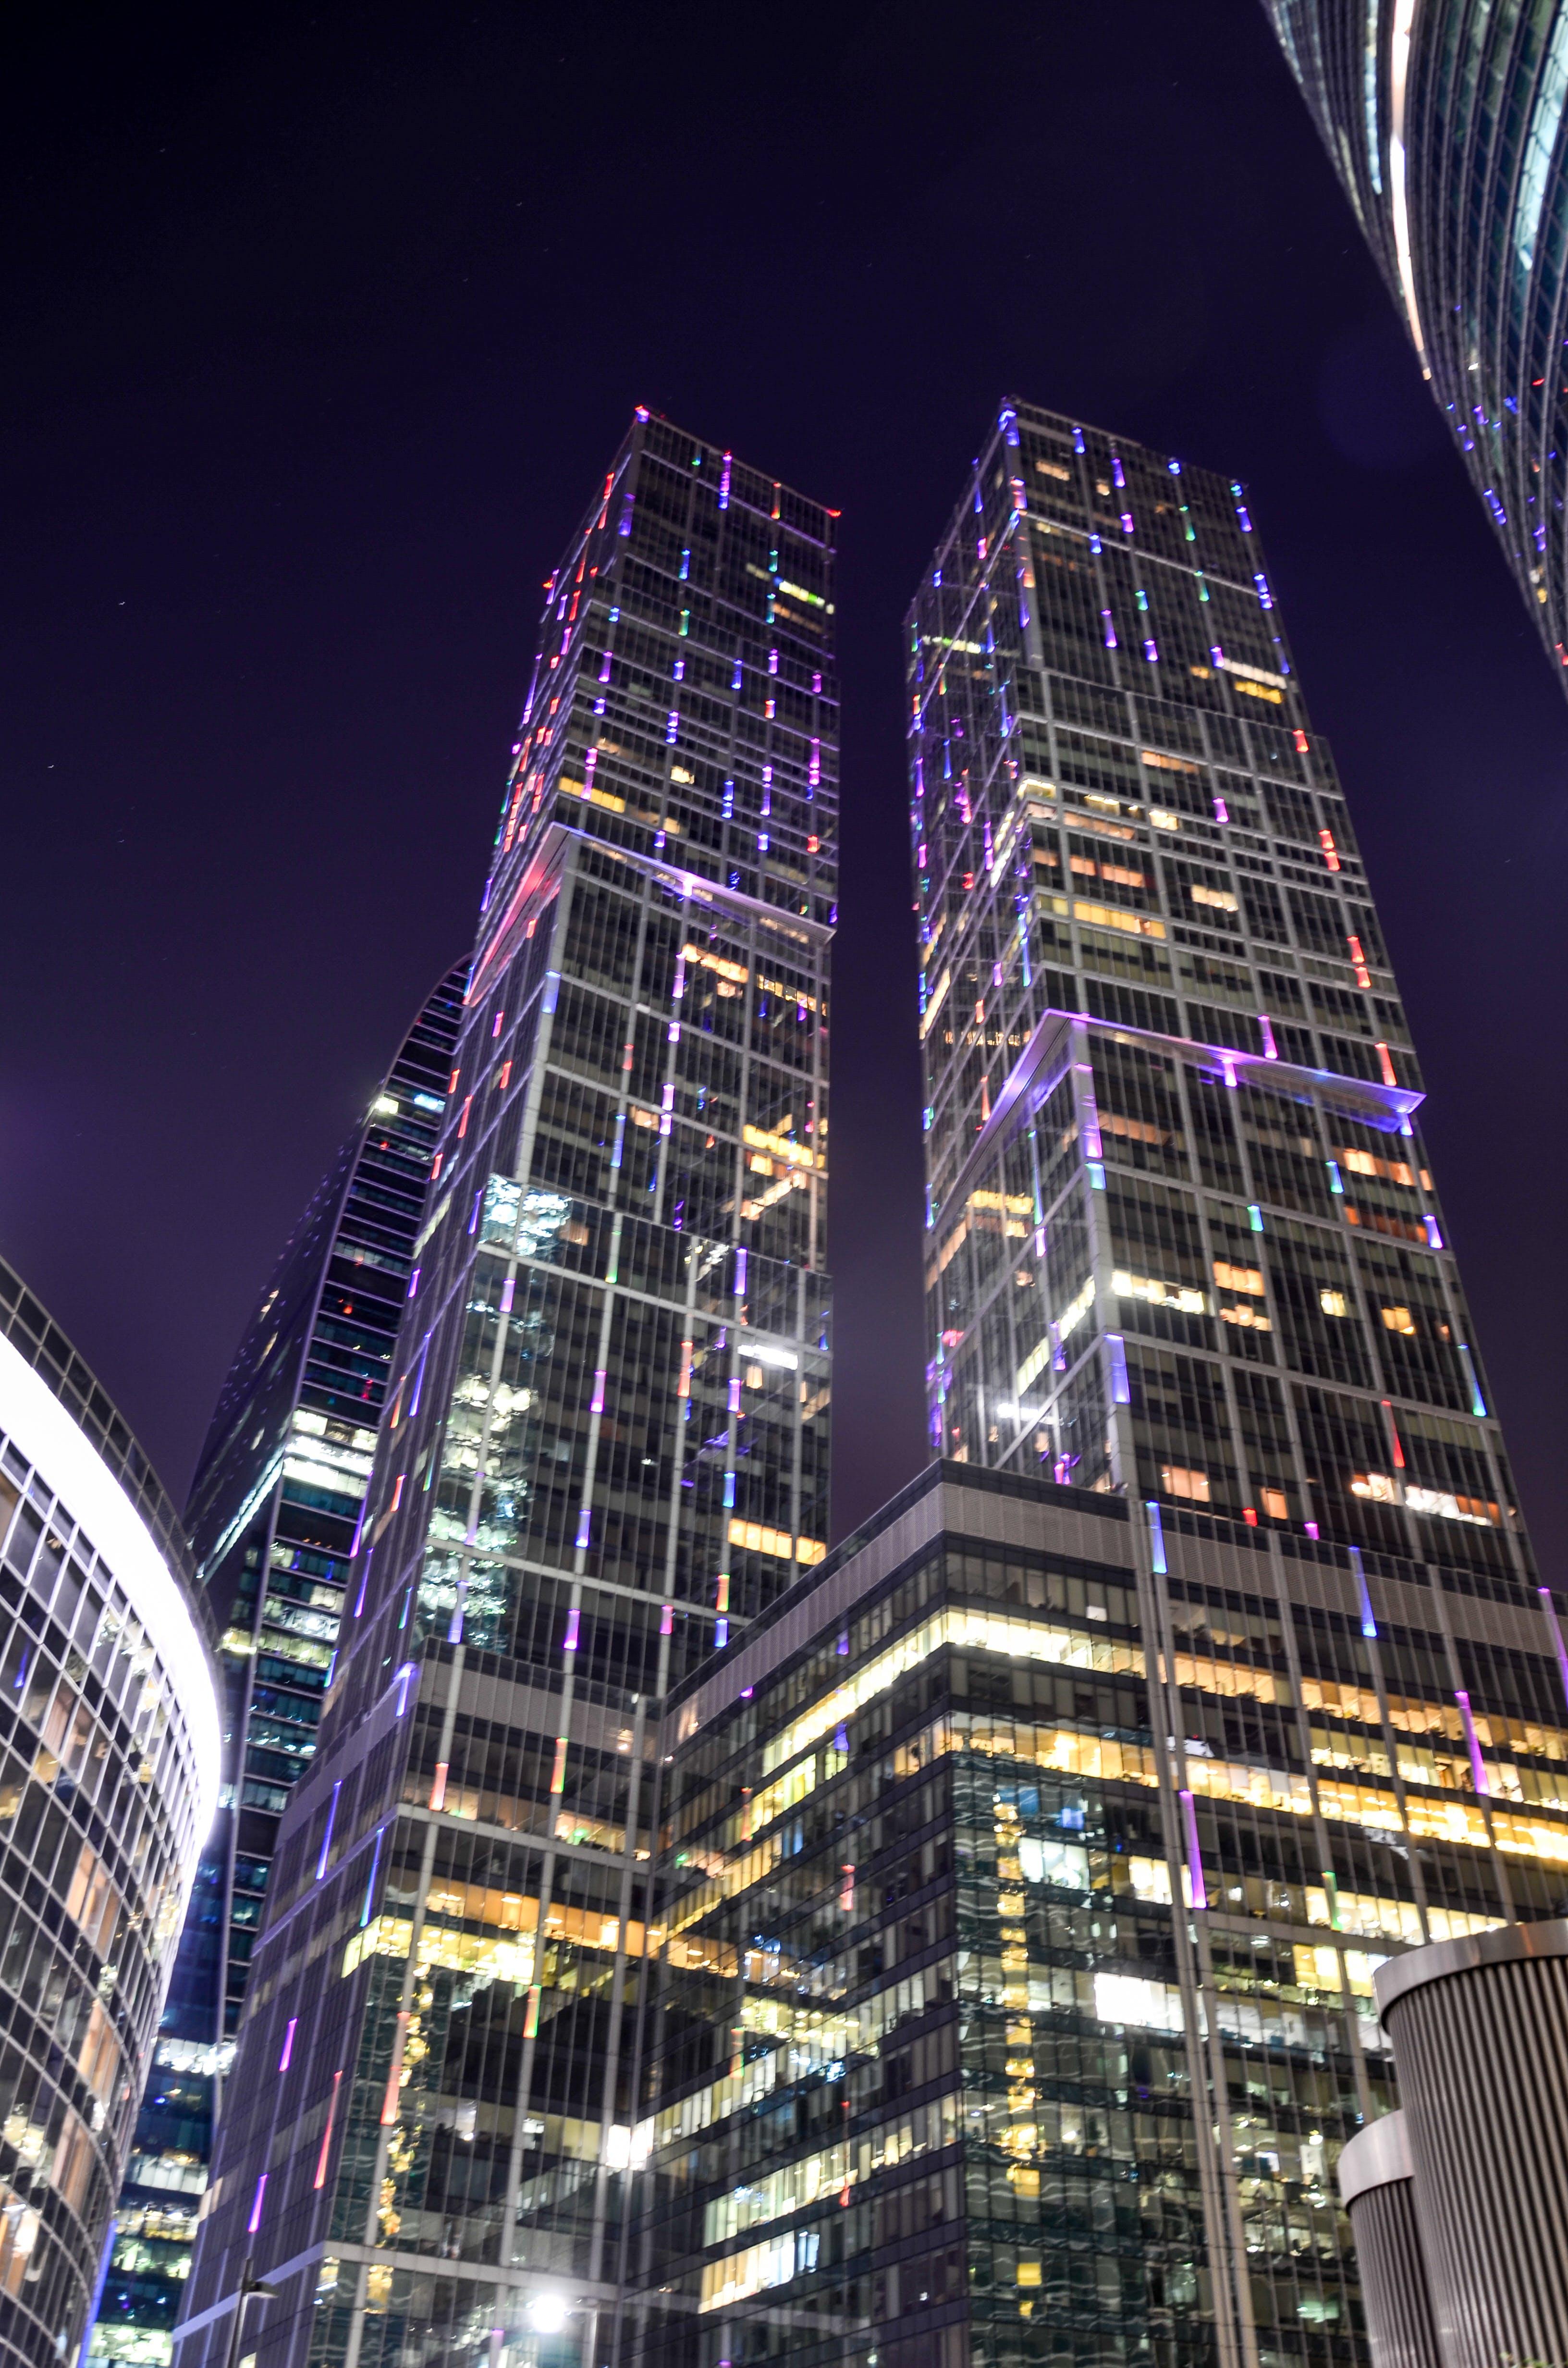 architectural design, buildings, city